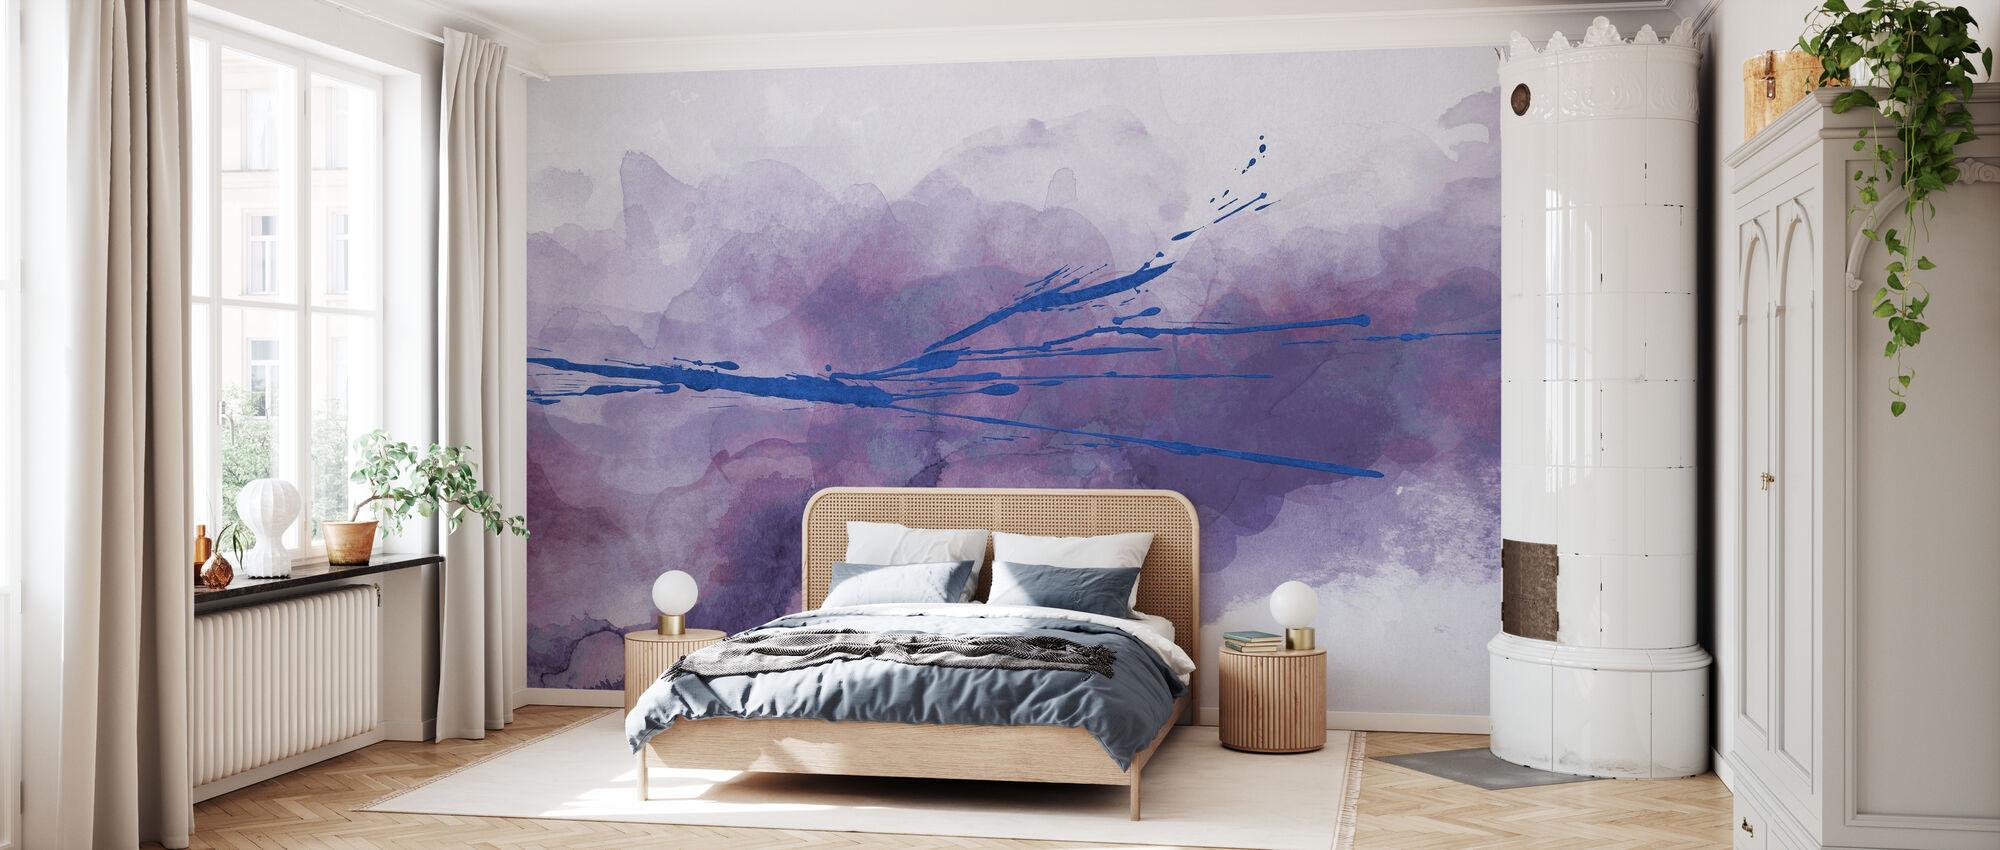 Accidental Watercolor - Violet - Wallpaper - Bedroom